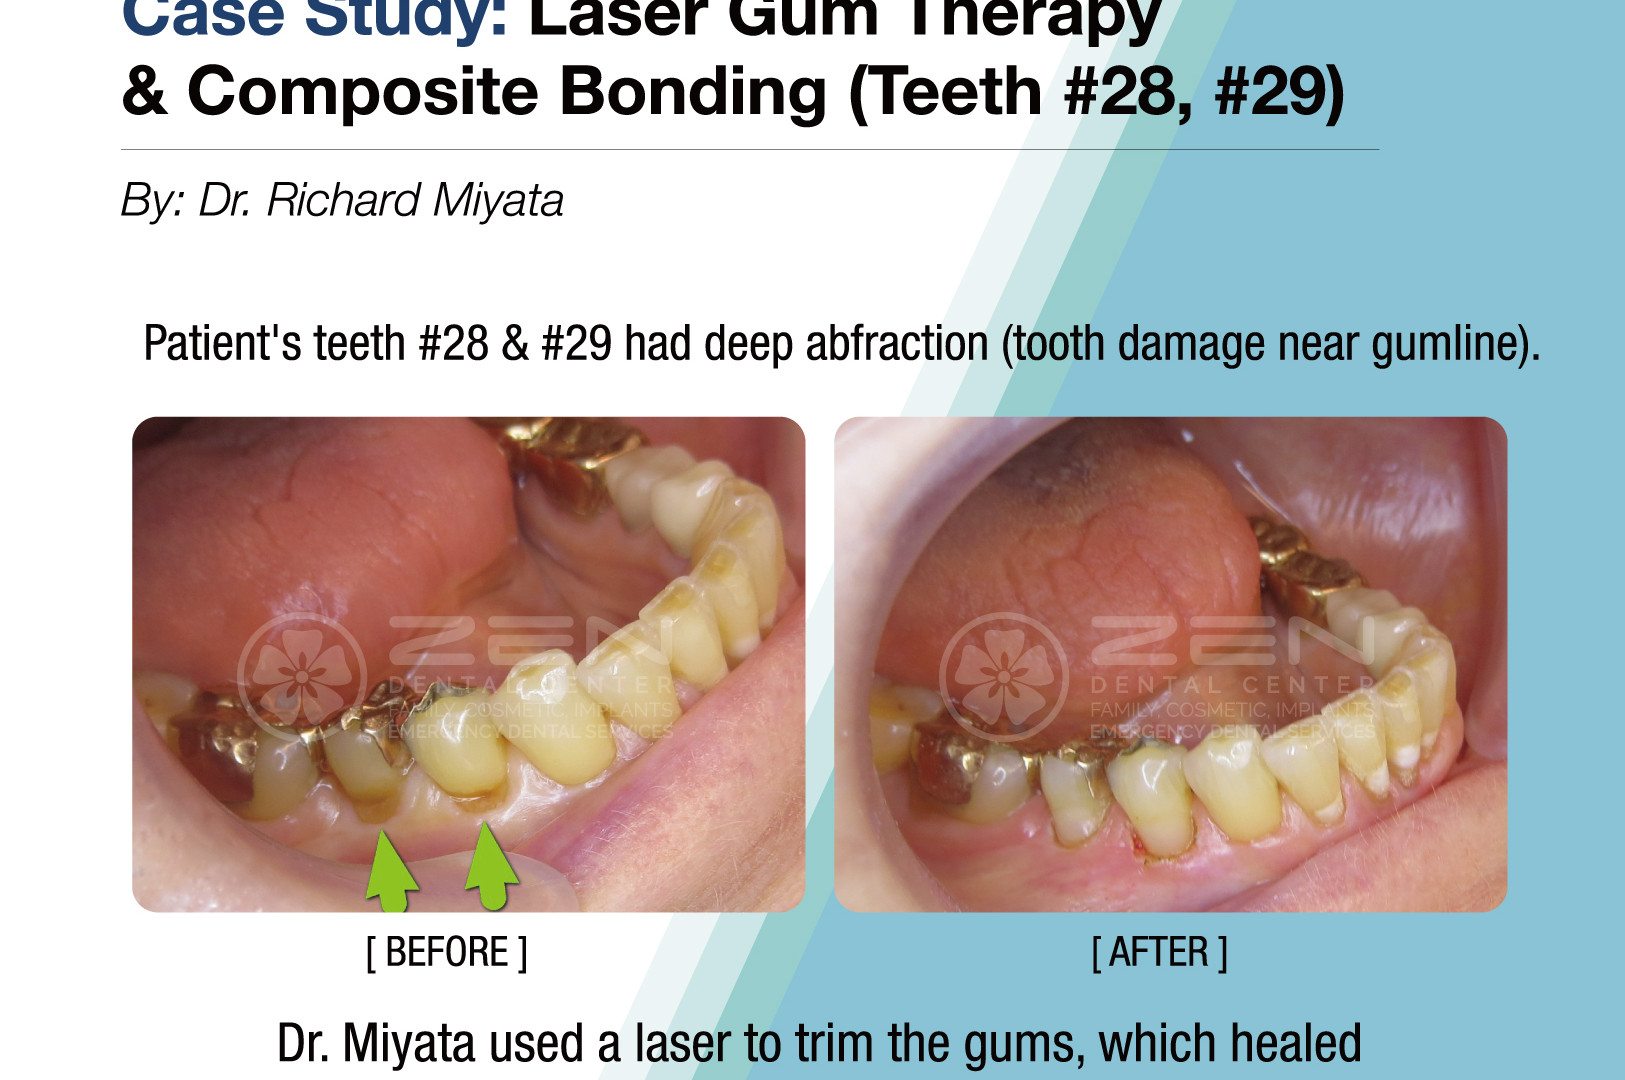 Case Study: Laser Gum Therapy & Composite Bonding (Teeth #28, 29)